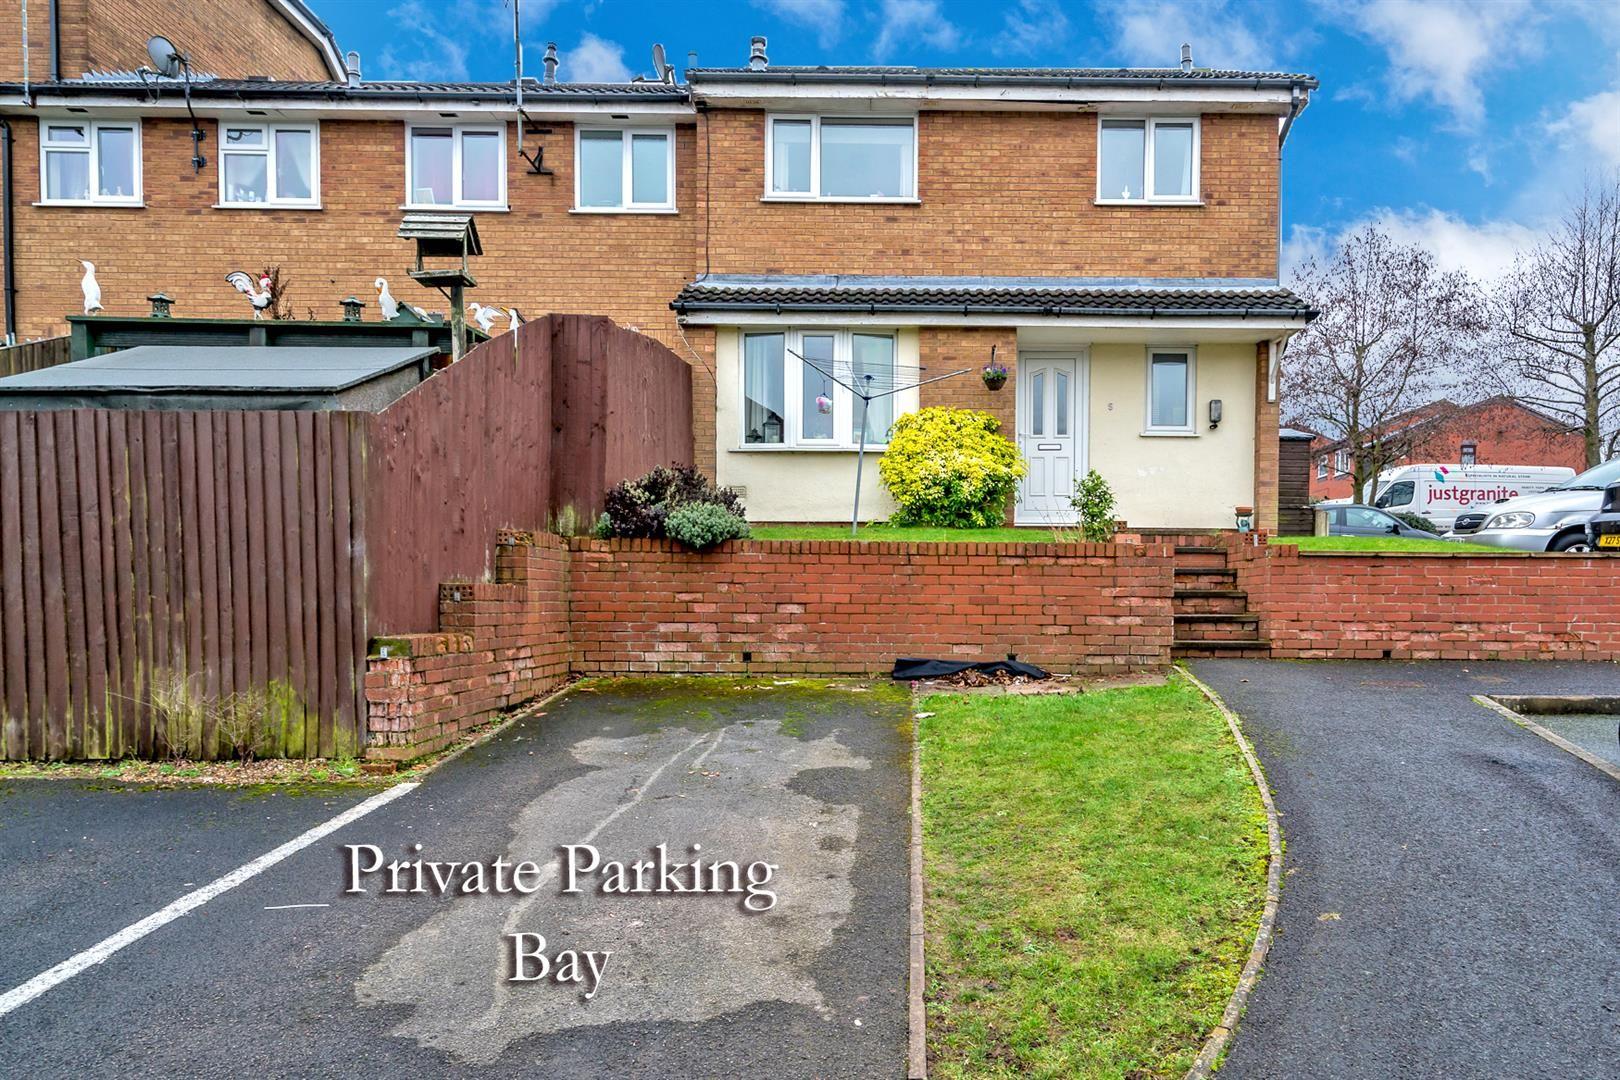 Property photo 1 of 14. Acorn Close, Cannock, Ws11 7Wf-14 Parking.Jpg